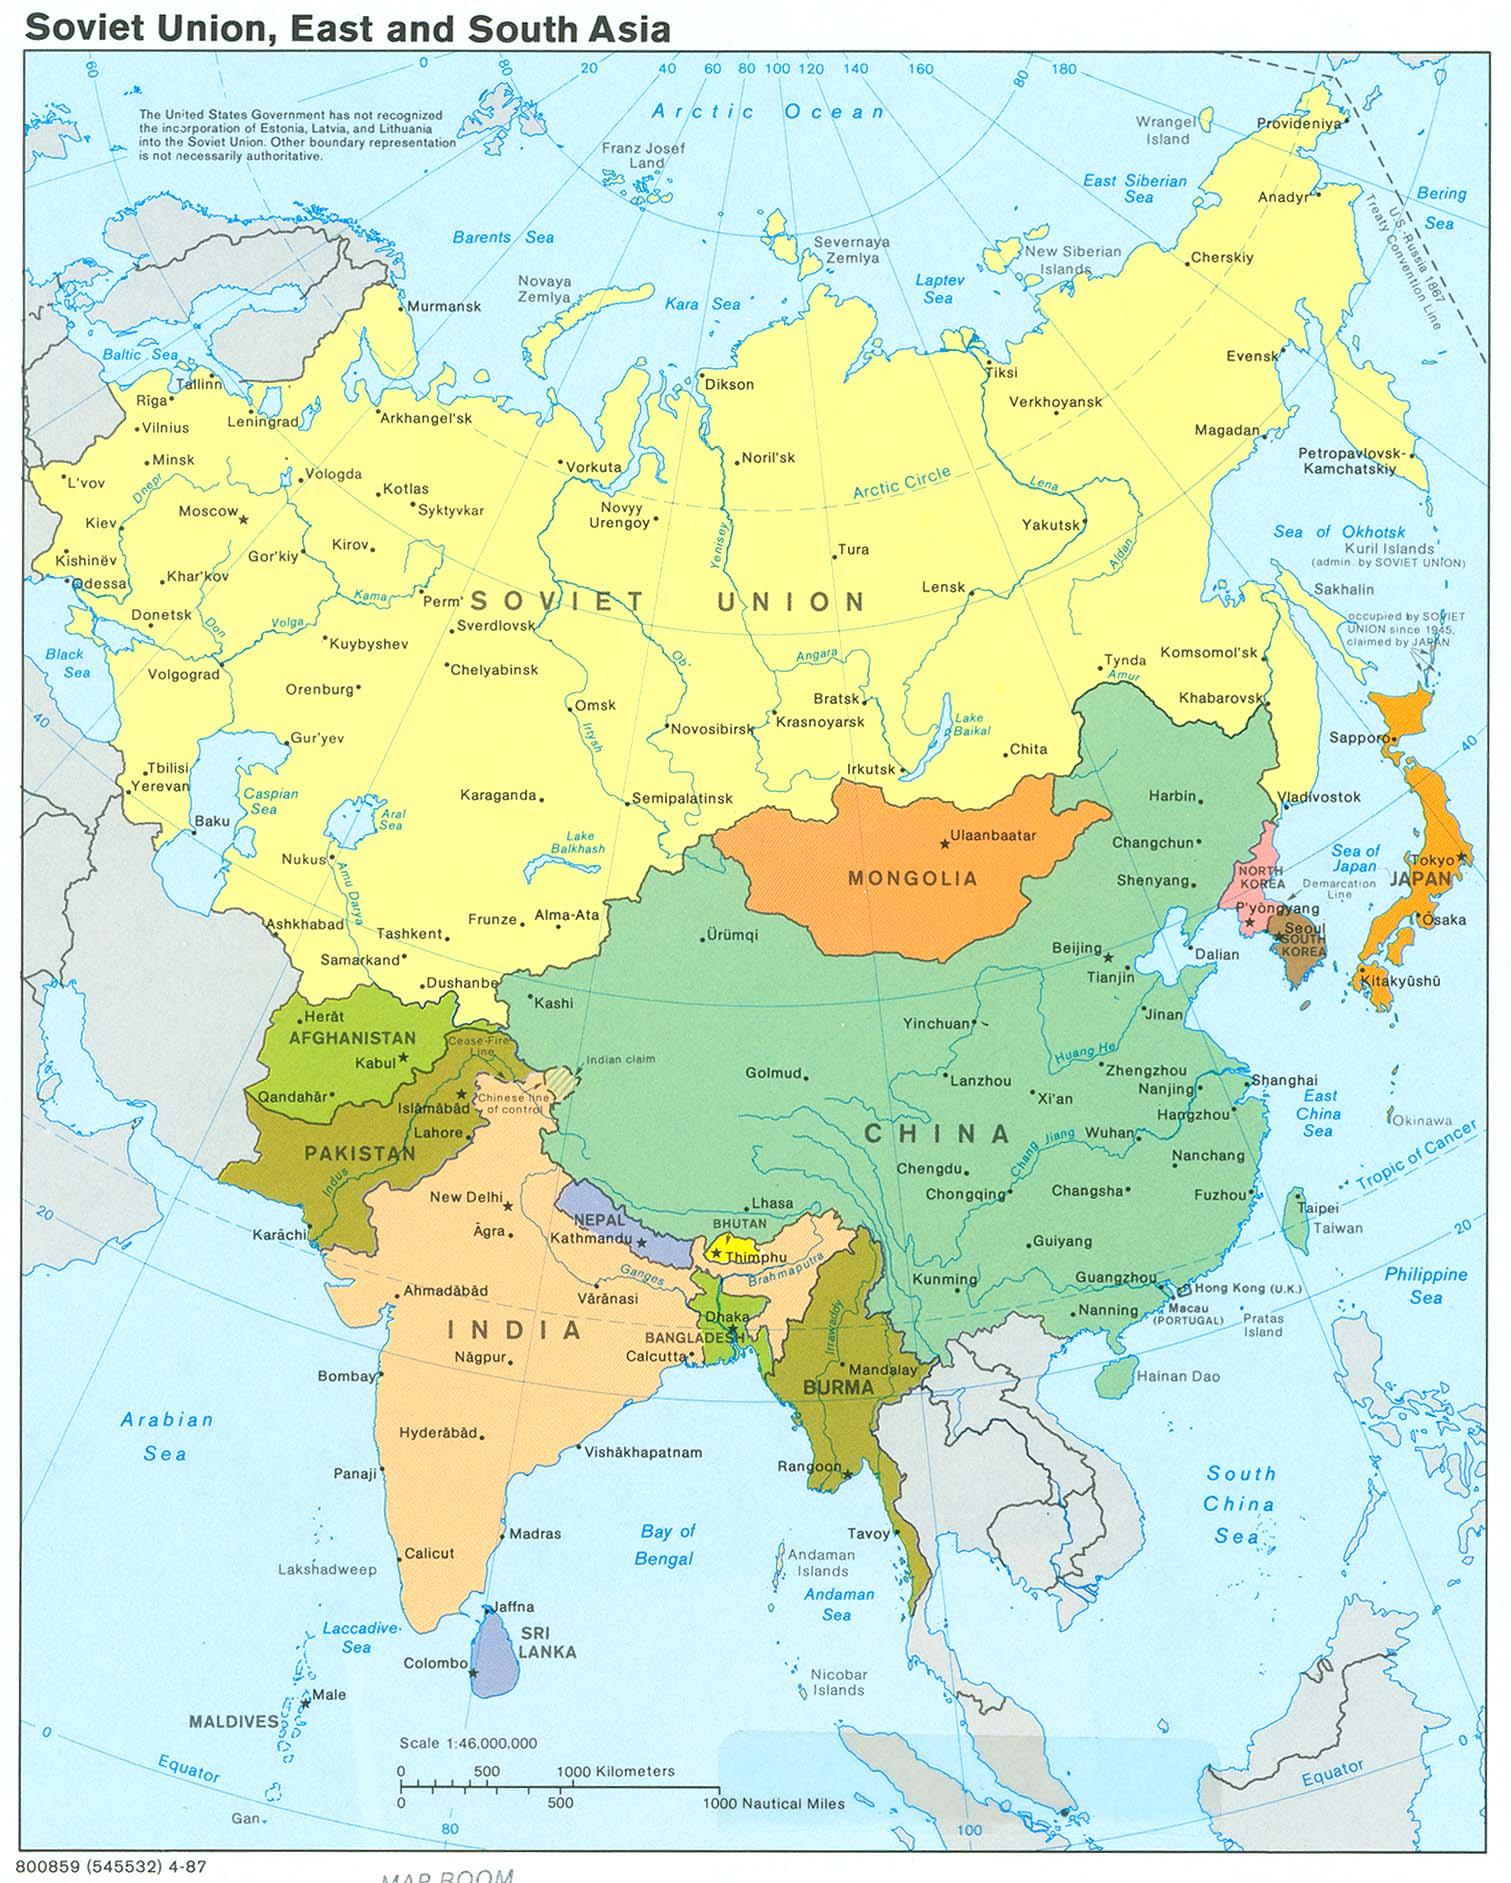 Russia And Eurasian Republics Map : russia, eurasian, republics, GEOGRAPHY